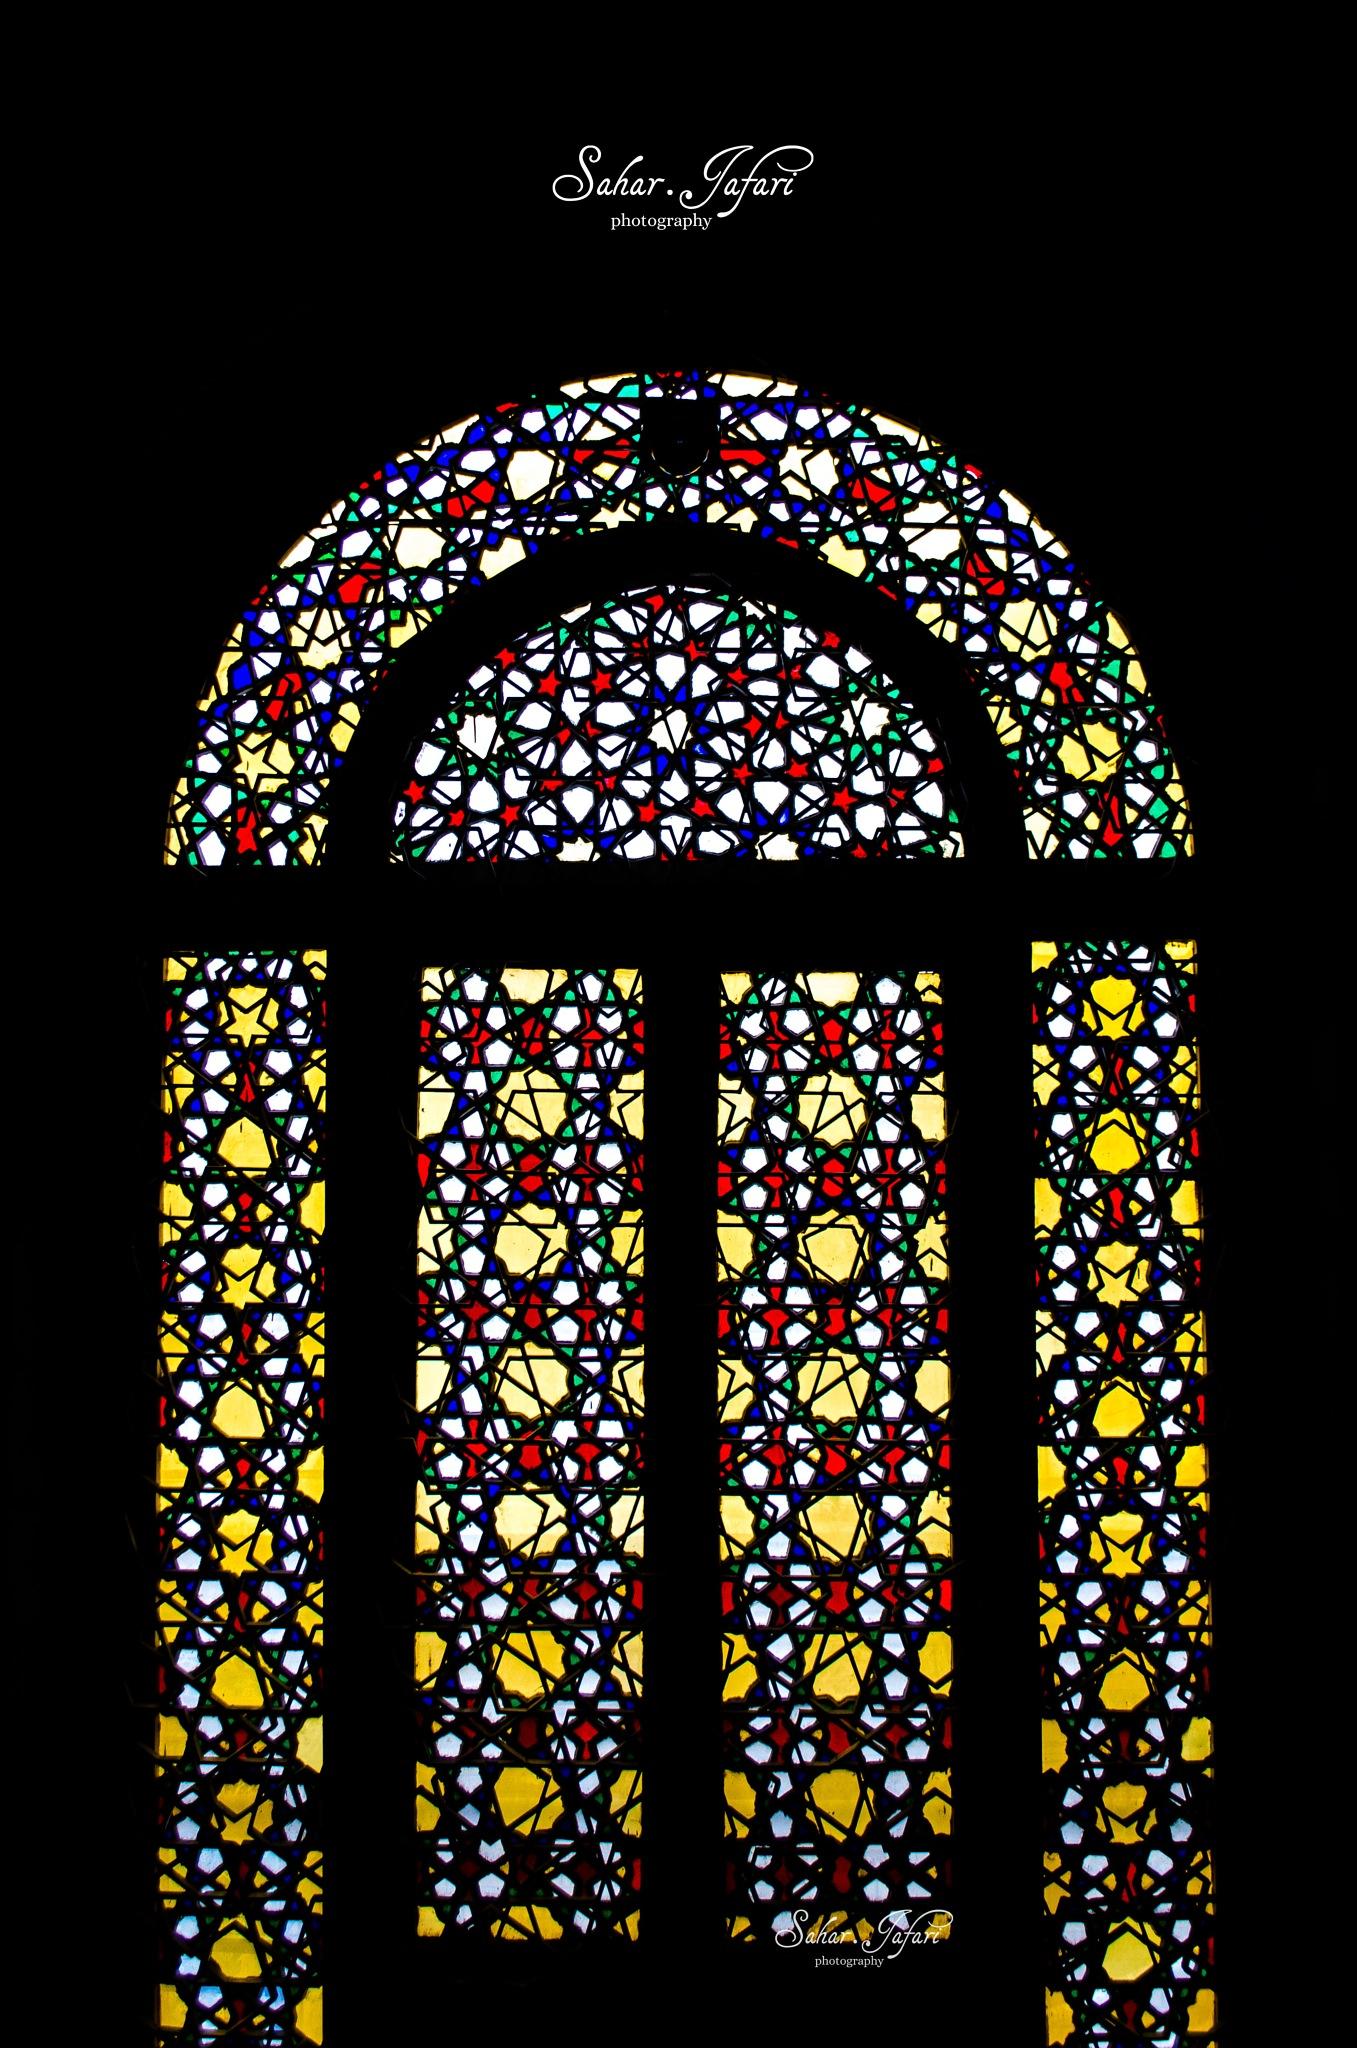 The window by Sahar.Jafari